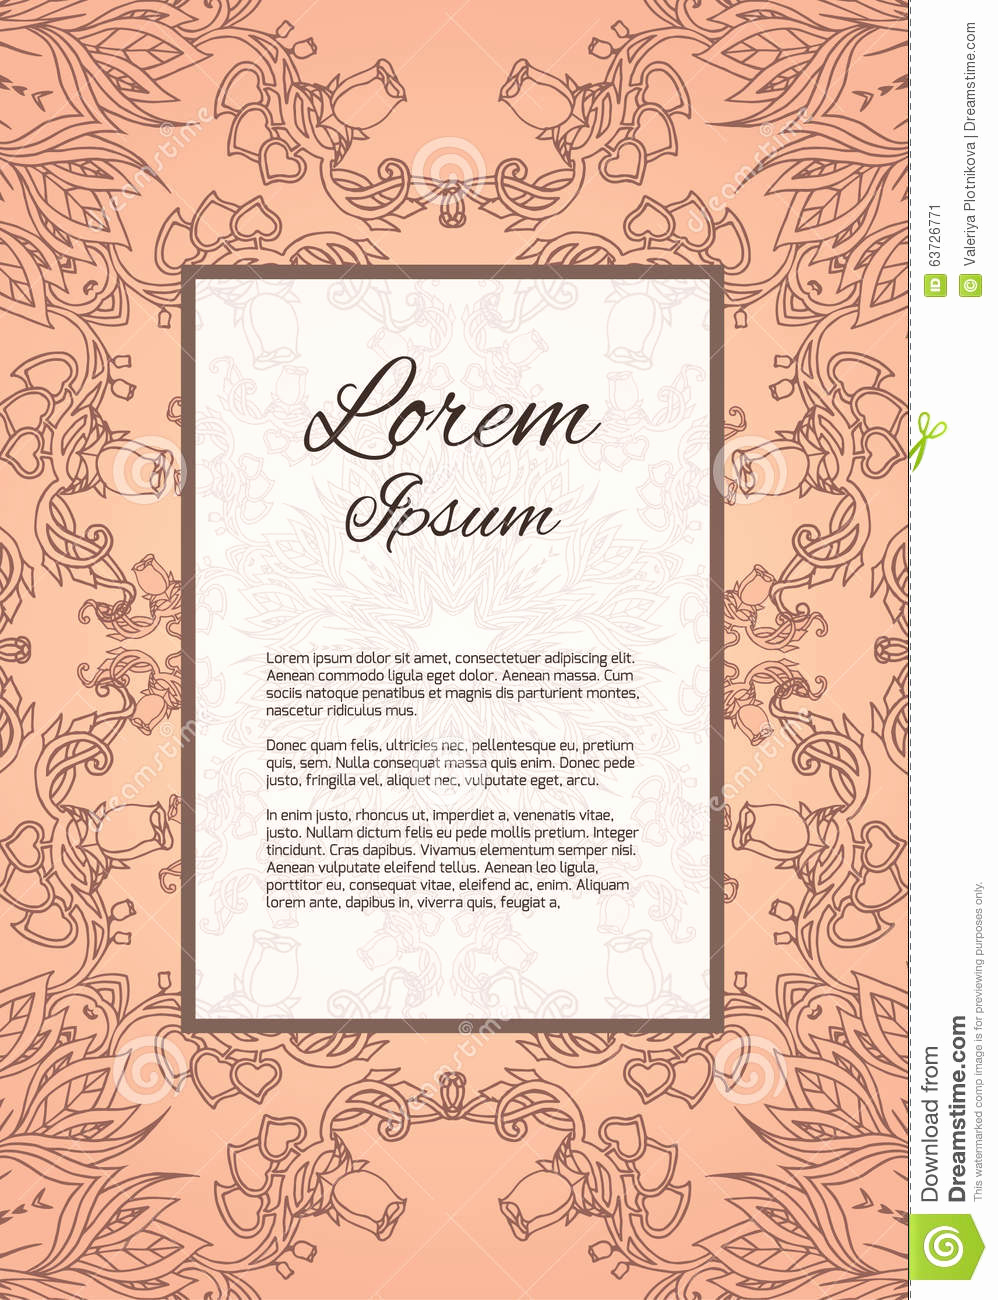 Thank You Letter for Invitation Lovely Template Thank You Letter Invitation Cover Stock Vector